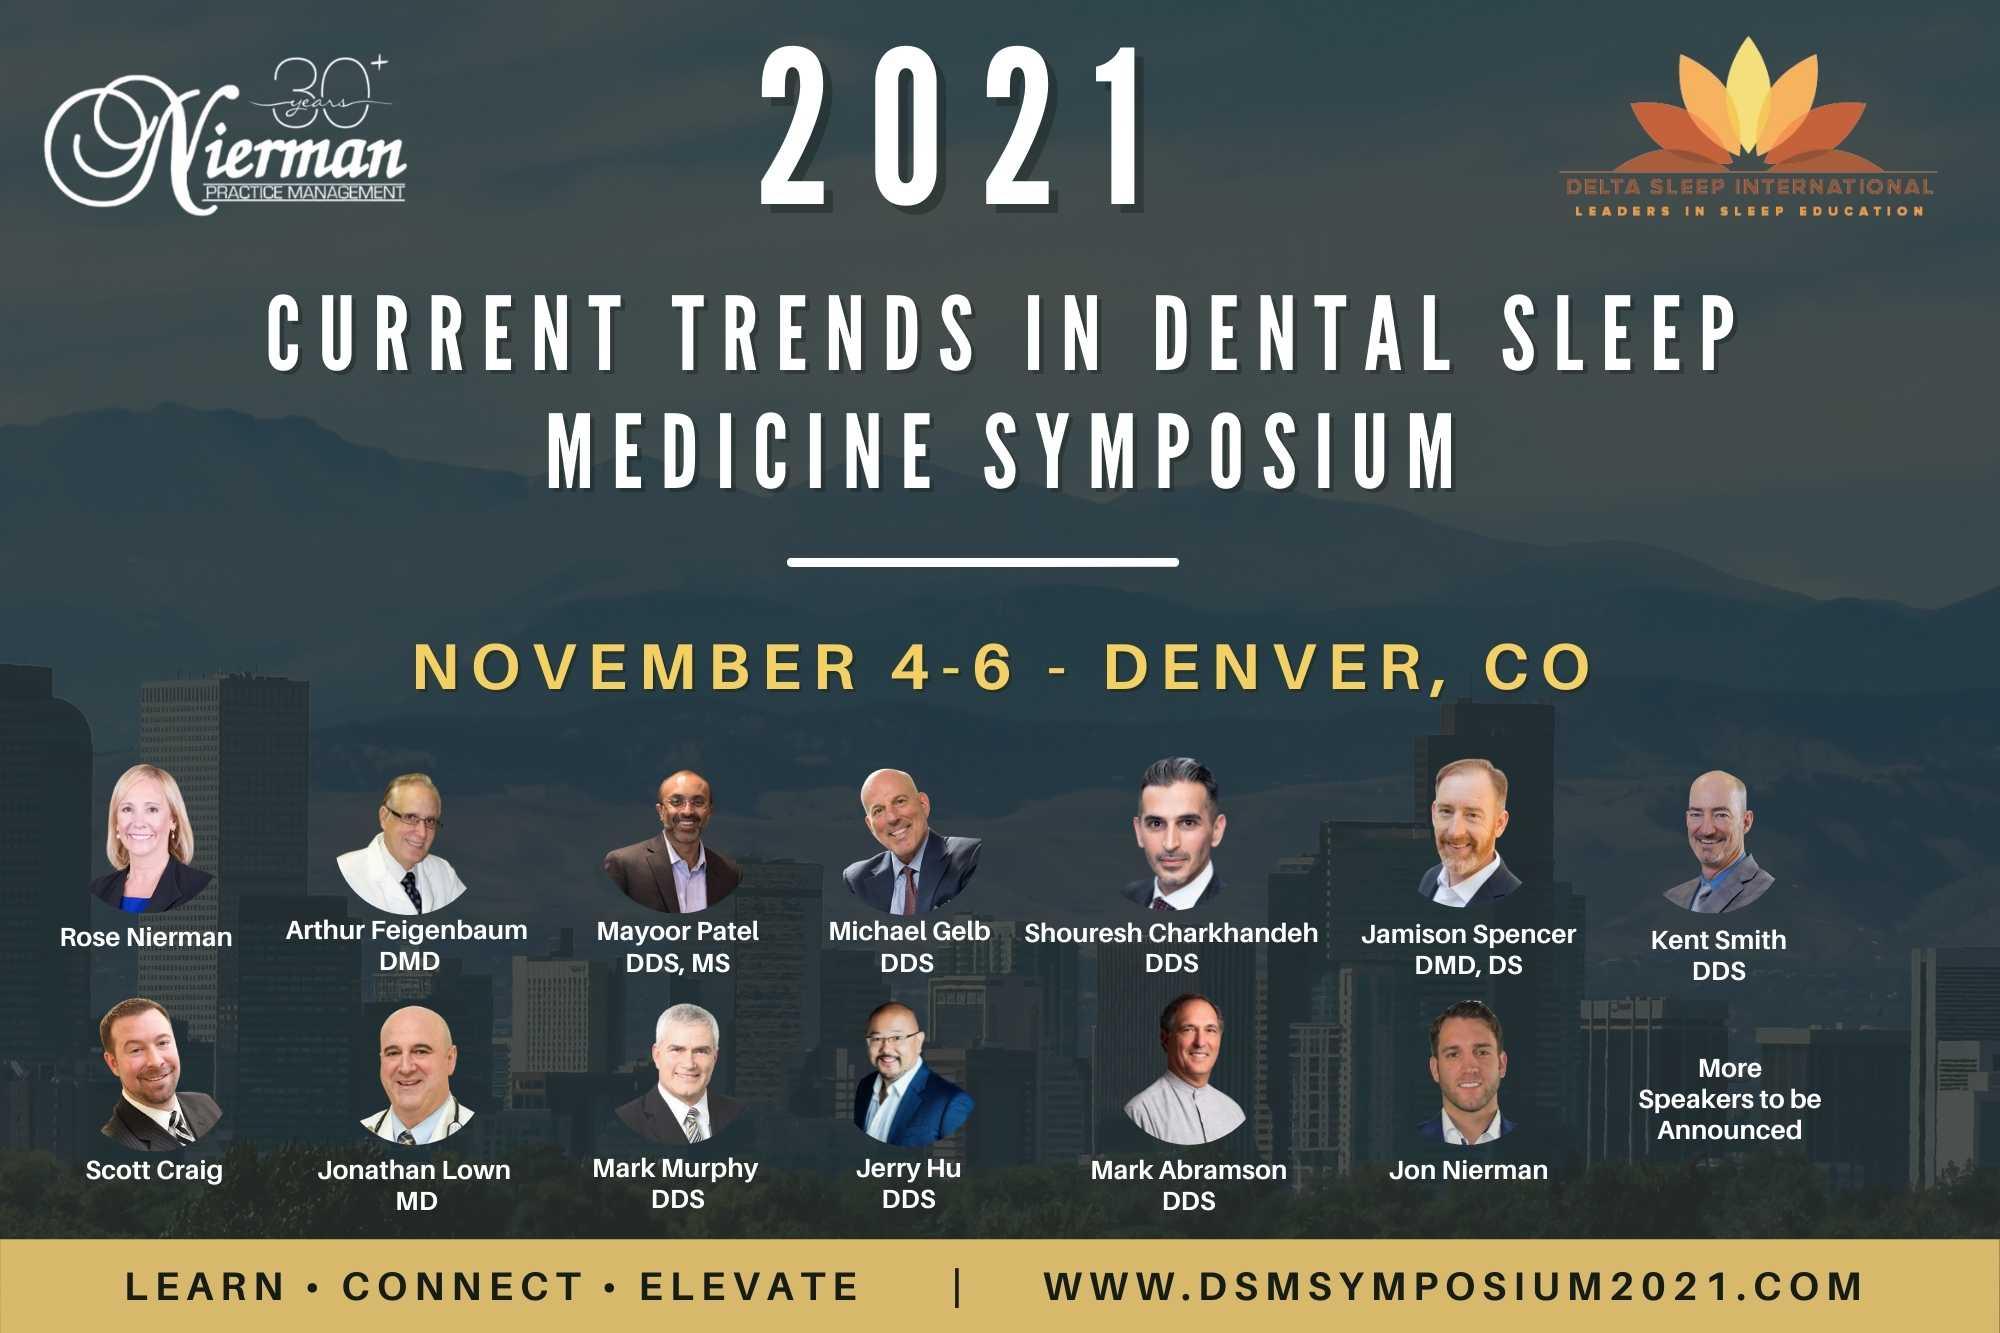 Dental Sleep Symposium for site